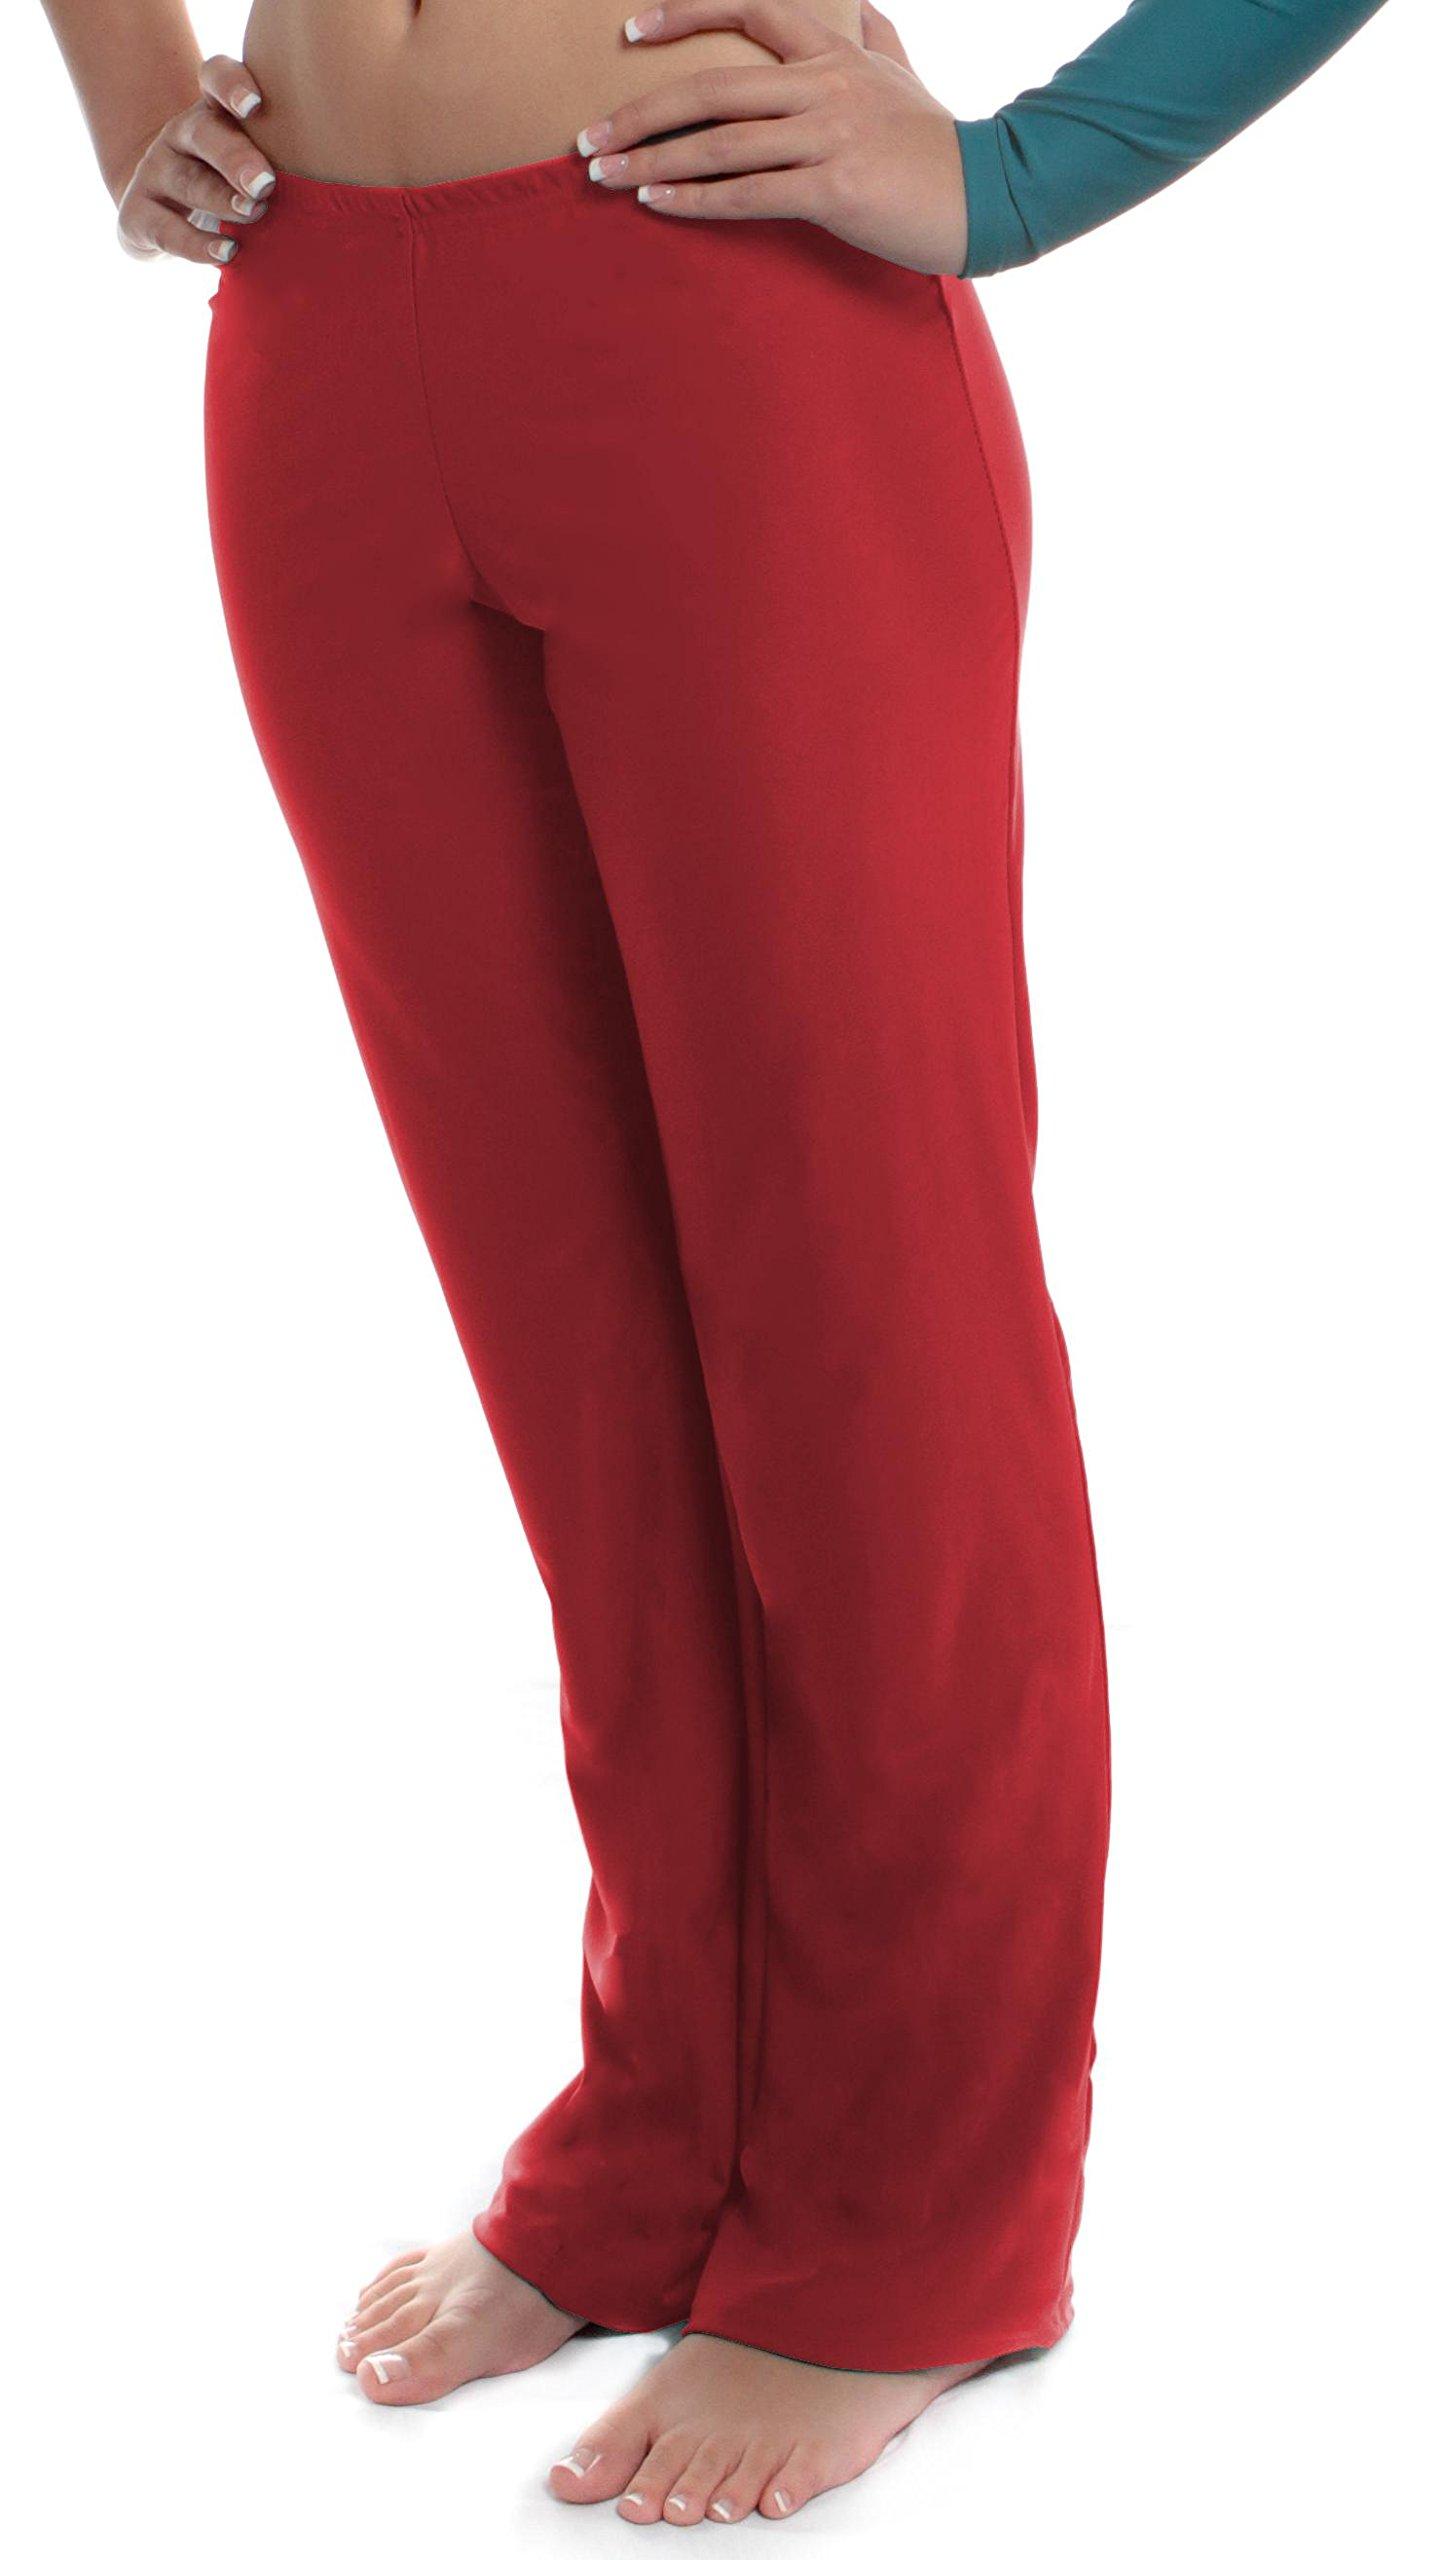 B Dancewear Girls Jazz Pants Large Red Child and Kid Sizes by B Dancewear